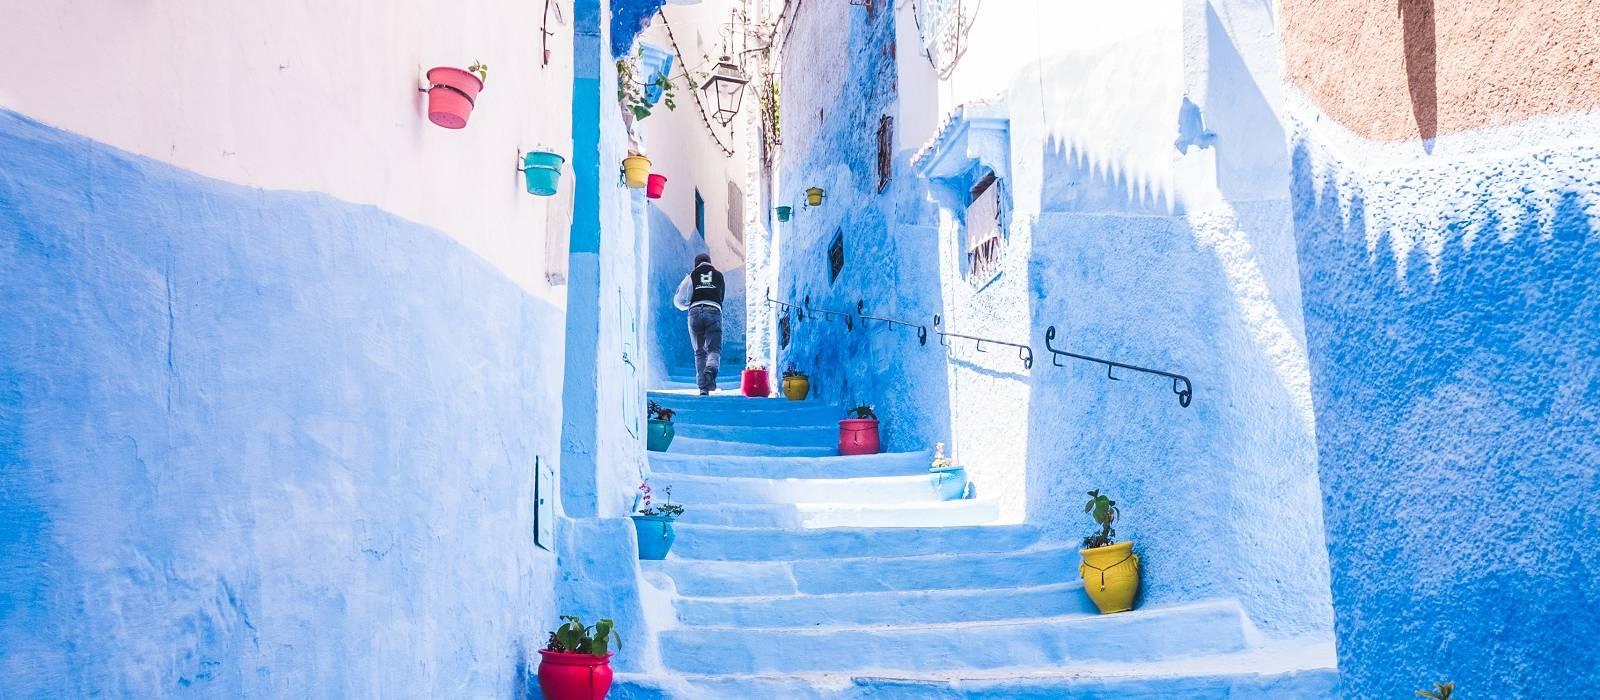 Enchanting Travels Morocco Blue city